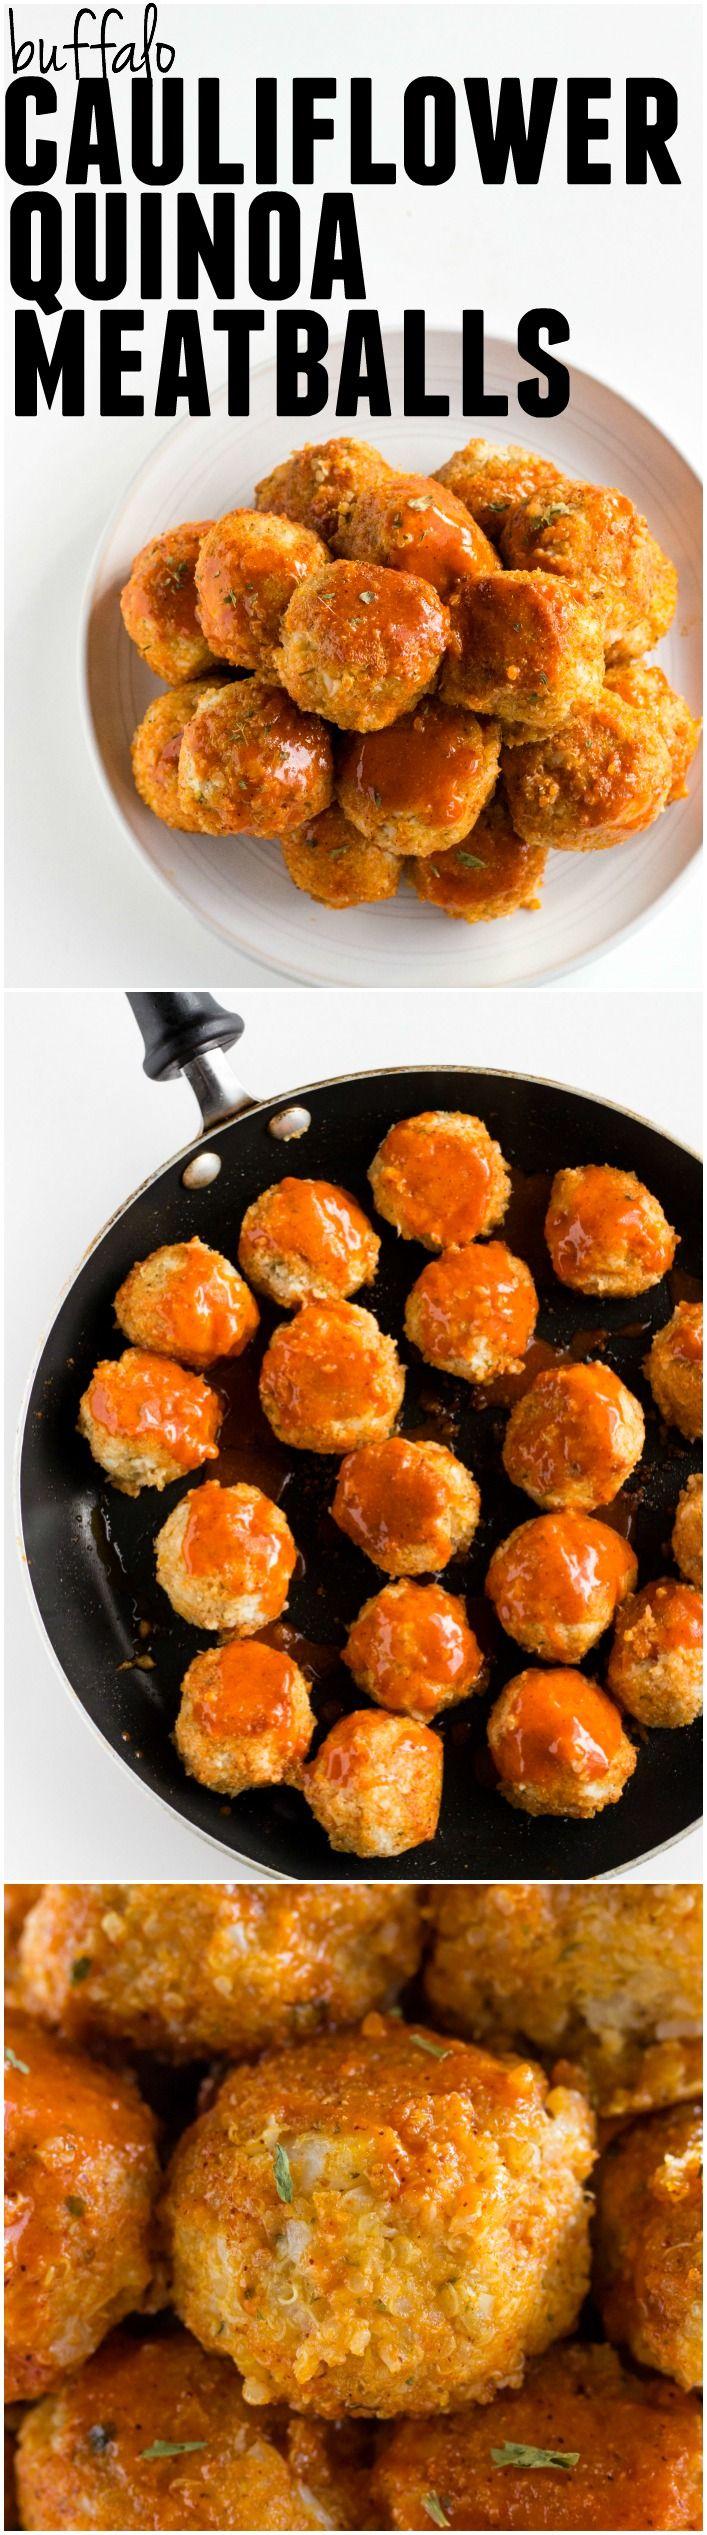 Buffalo Cauliflower Quinoa Meatballs